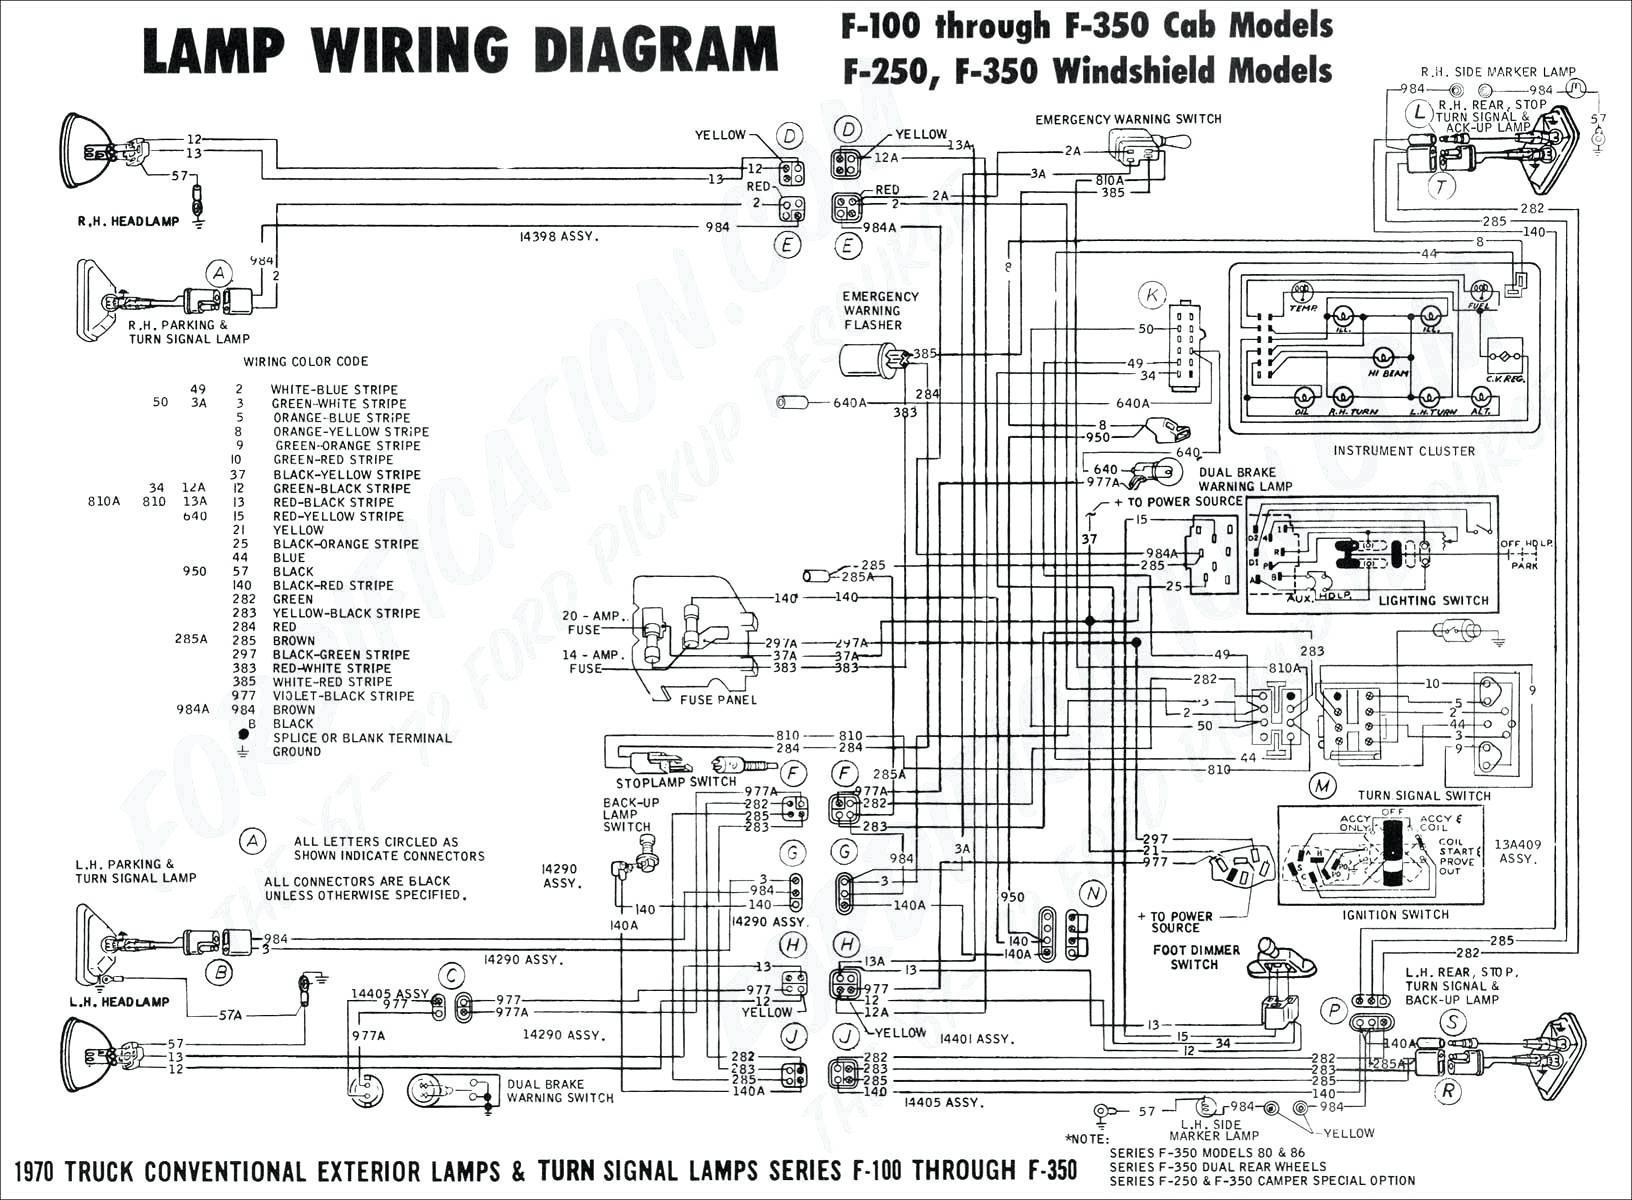 viper 3305v wiring diagram new peugeot 206 headlight fuse wiring diagram of viper 3305v wiring diagram